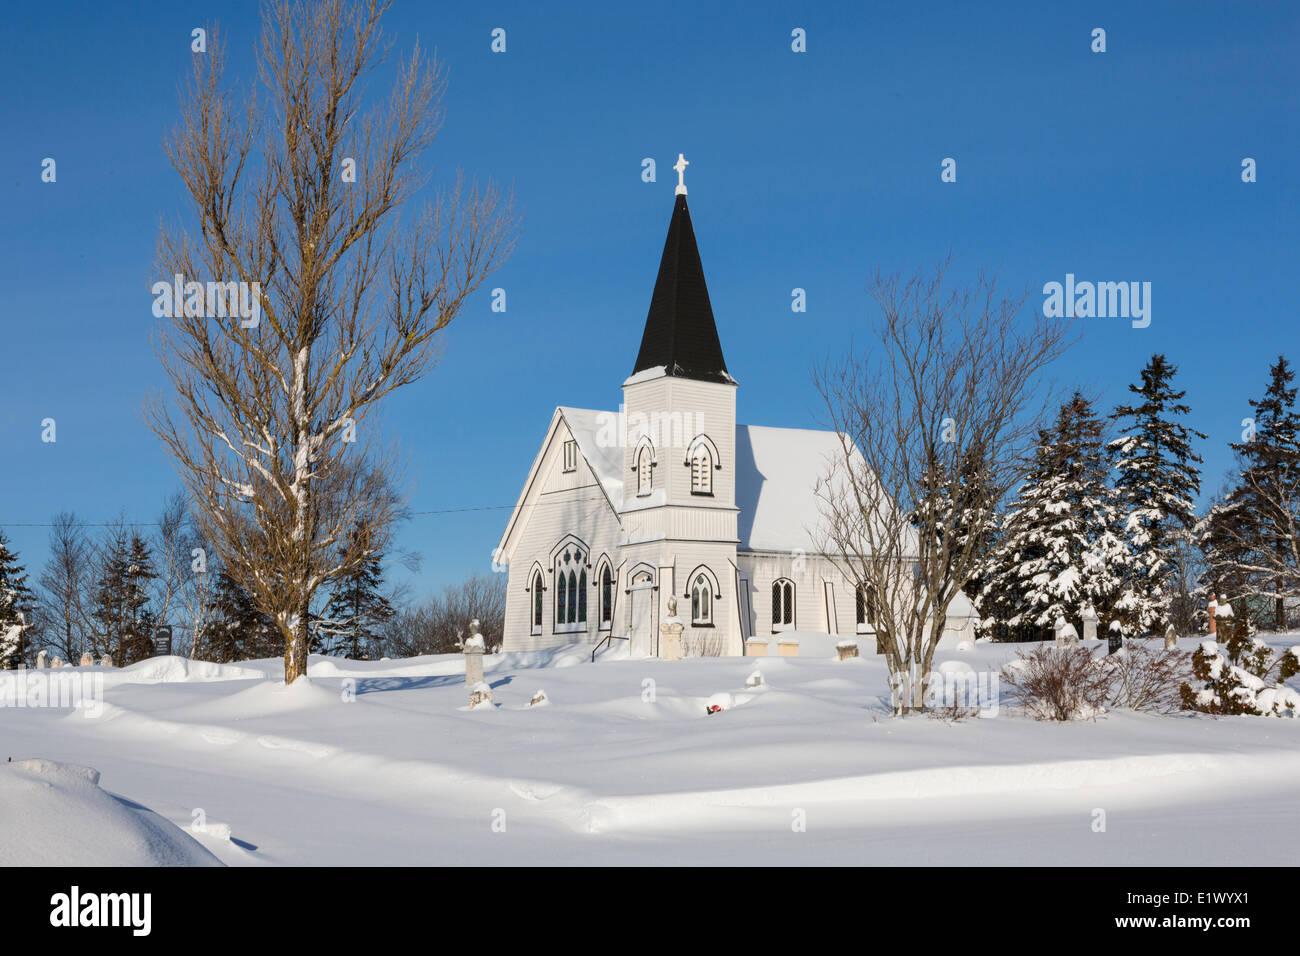 Christ Church Anglican Church, Summerfield, Prince Edward Island, Canada - Stock Image